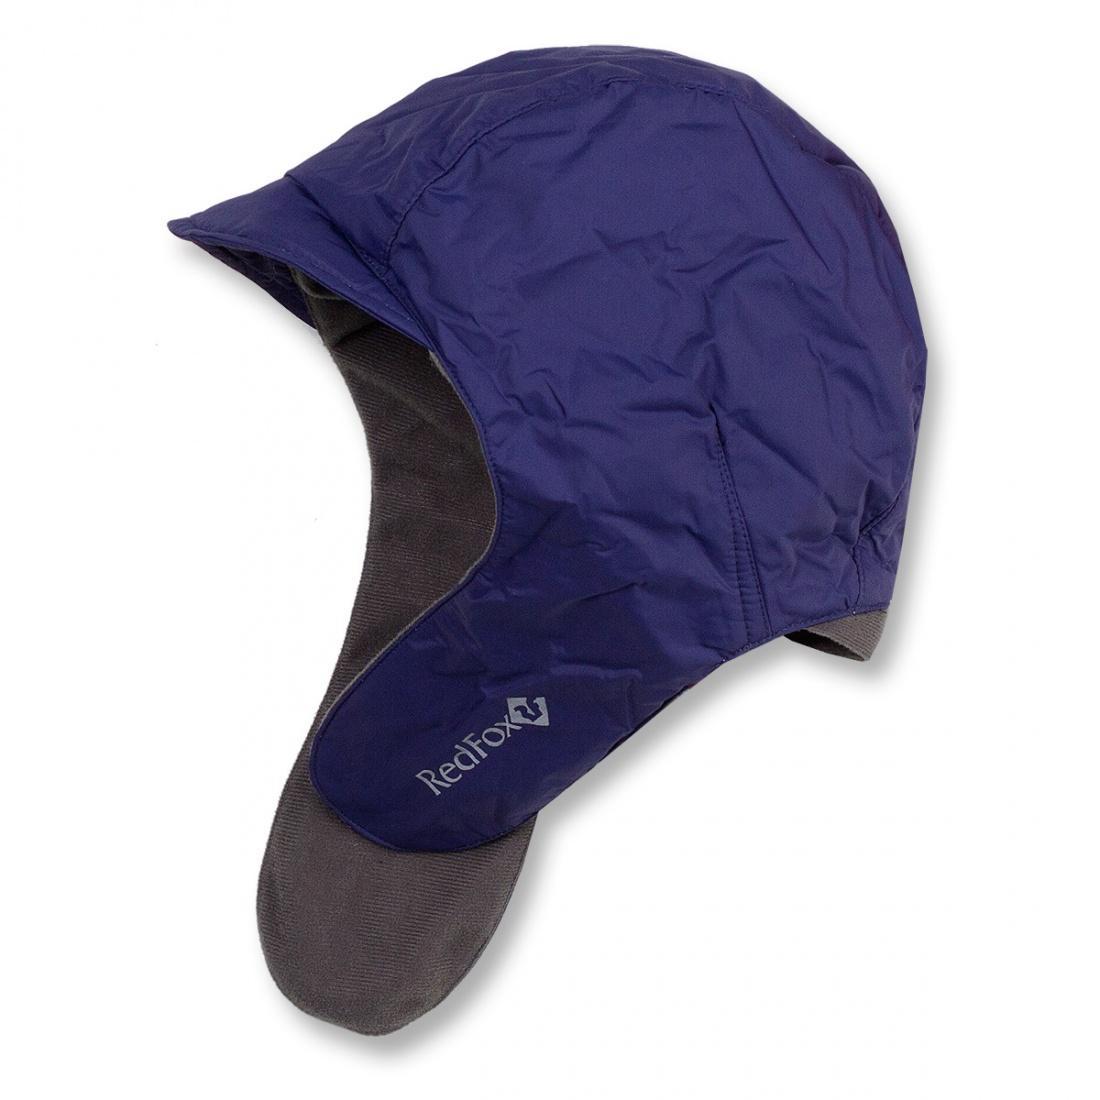 Шапка детска PilotУшанки<br><br> Удобна стильна шапочка дл детей от года. <br><br> <br><br><br><br> Материал – Dry Factor 1000.<br><br> <br><br><br> Утеплитель – Omniterm Classic.<br><br> <br><br><br> Облегащий крой.<br><br> <br><br>...<br><br>Цвет: Темно-синий<br>Размер: XL